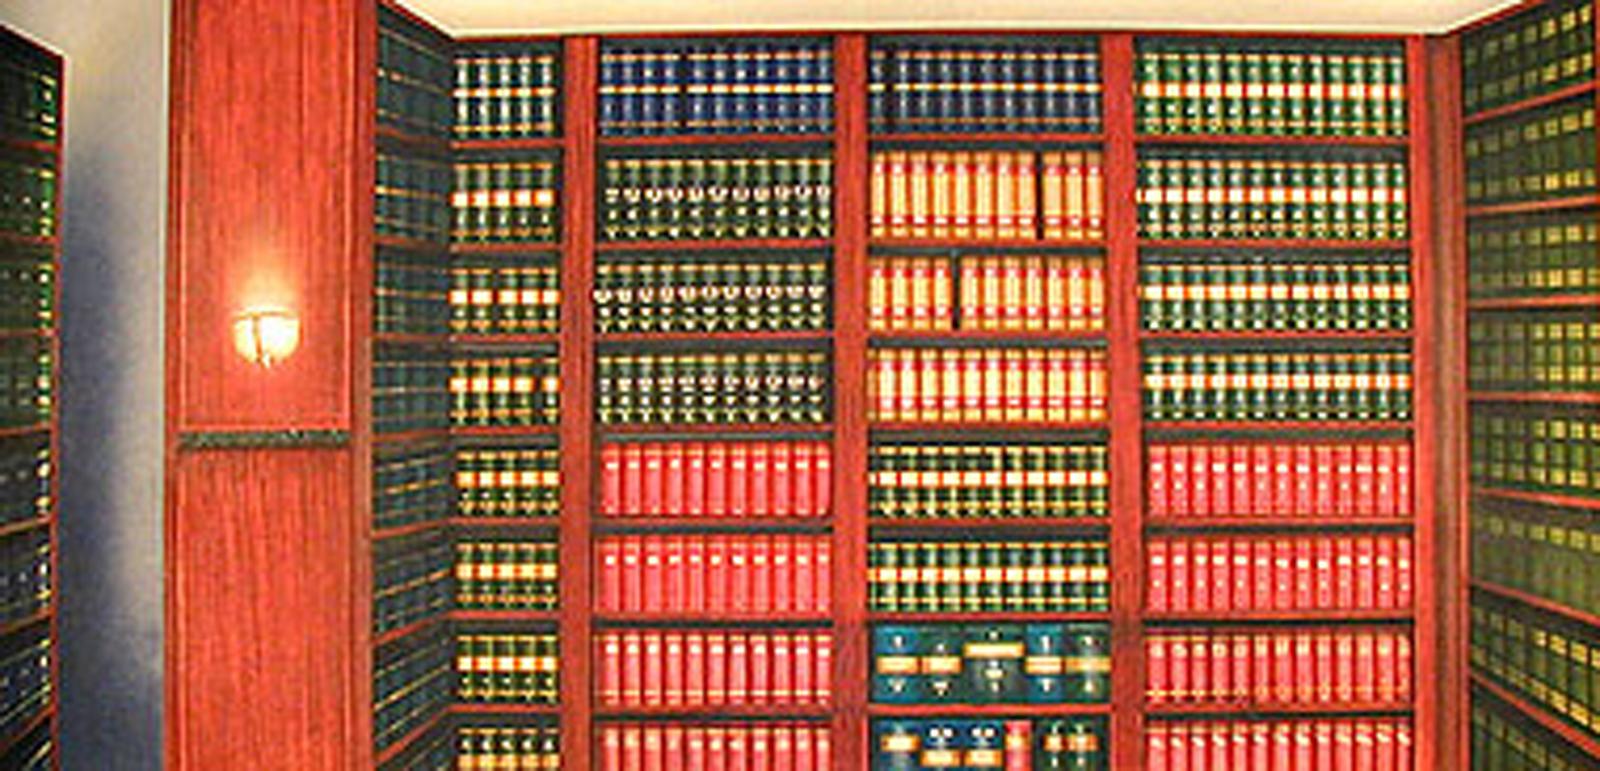 Law library 12' x 20'.jpg